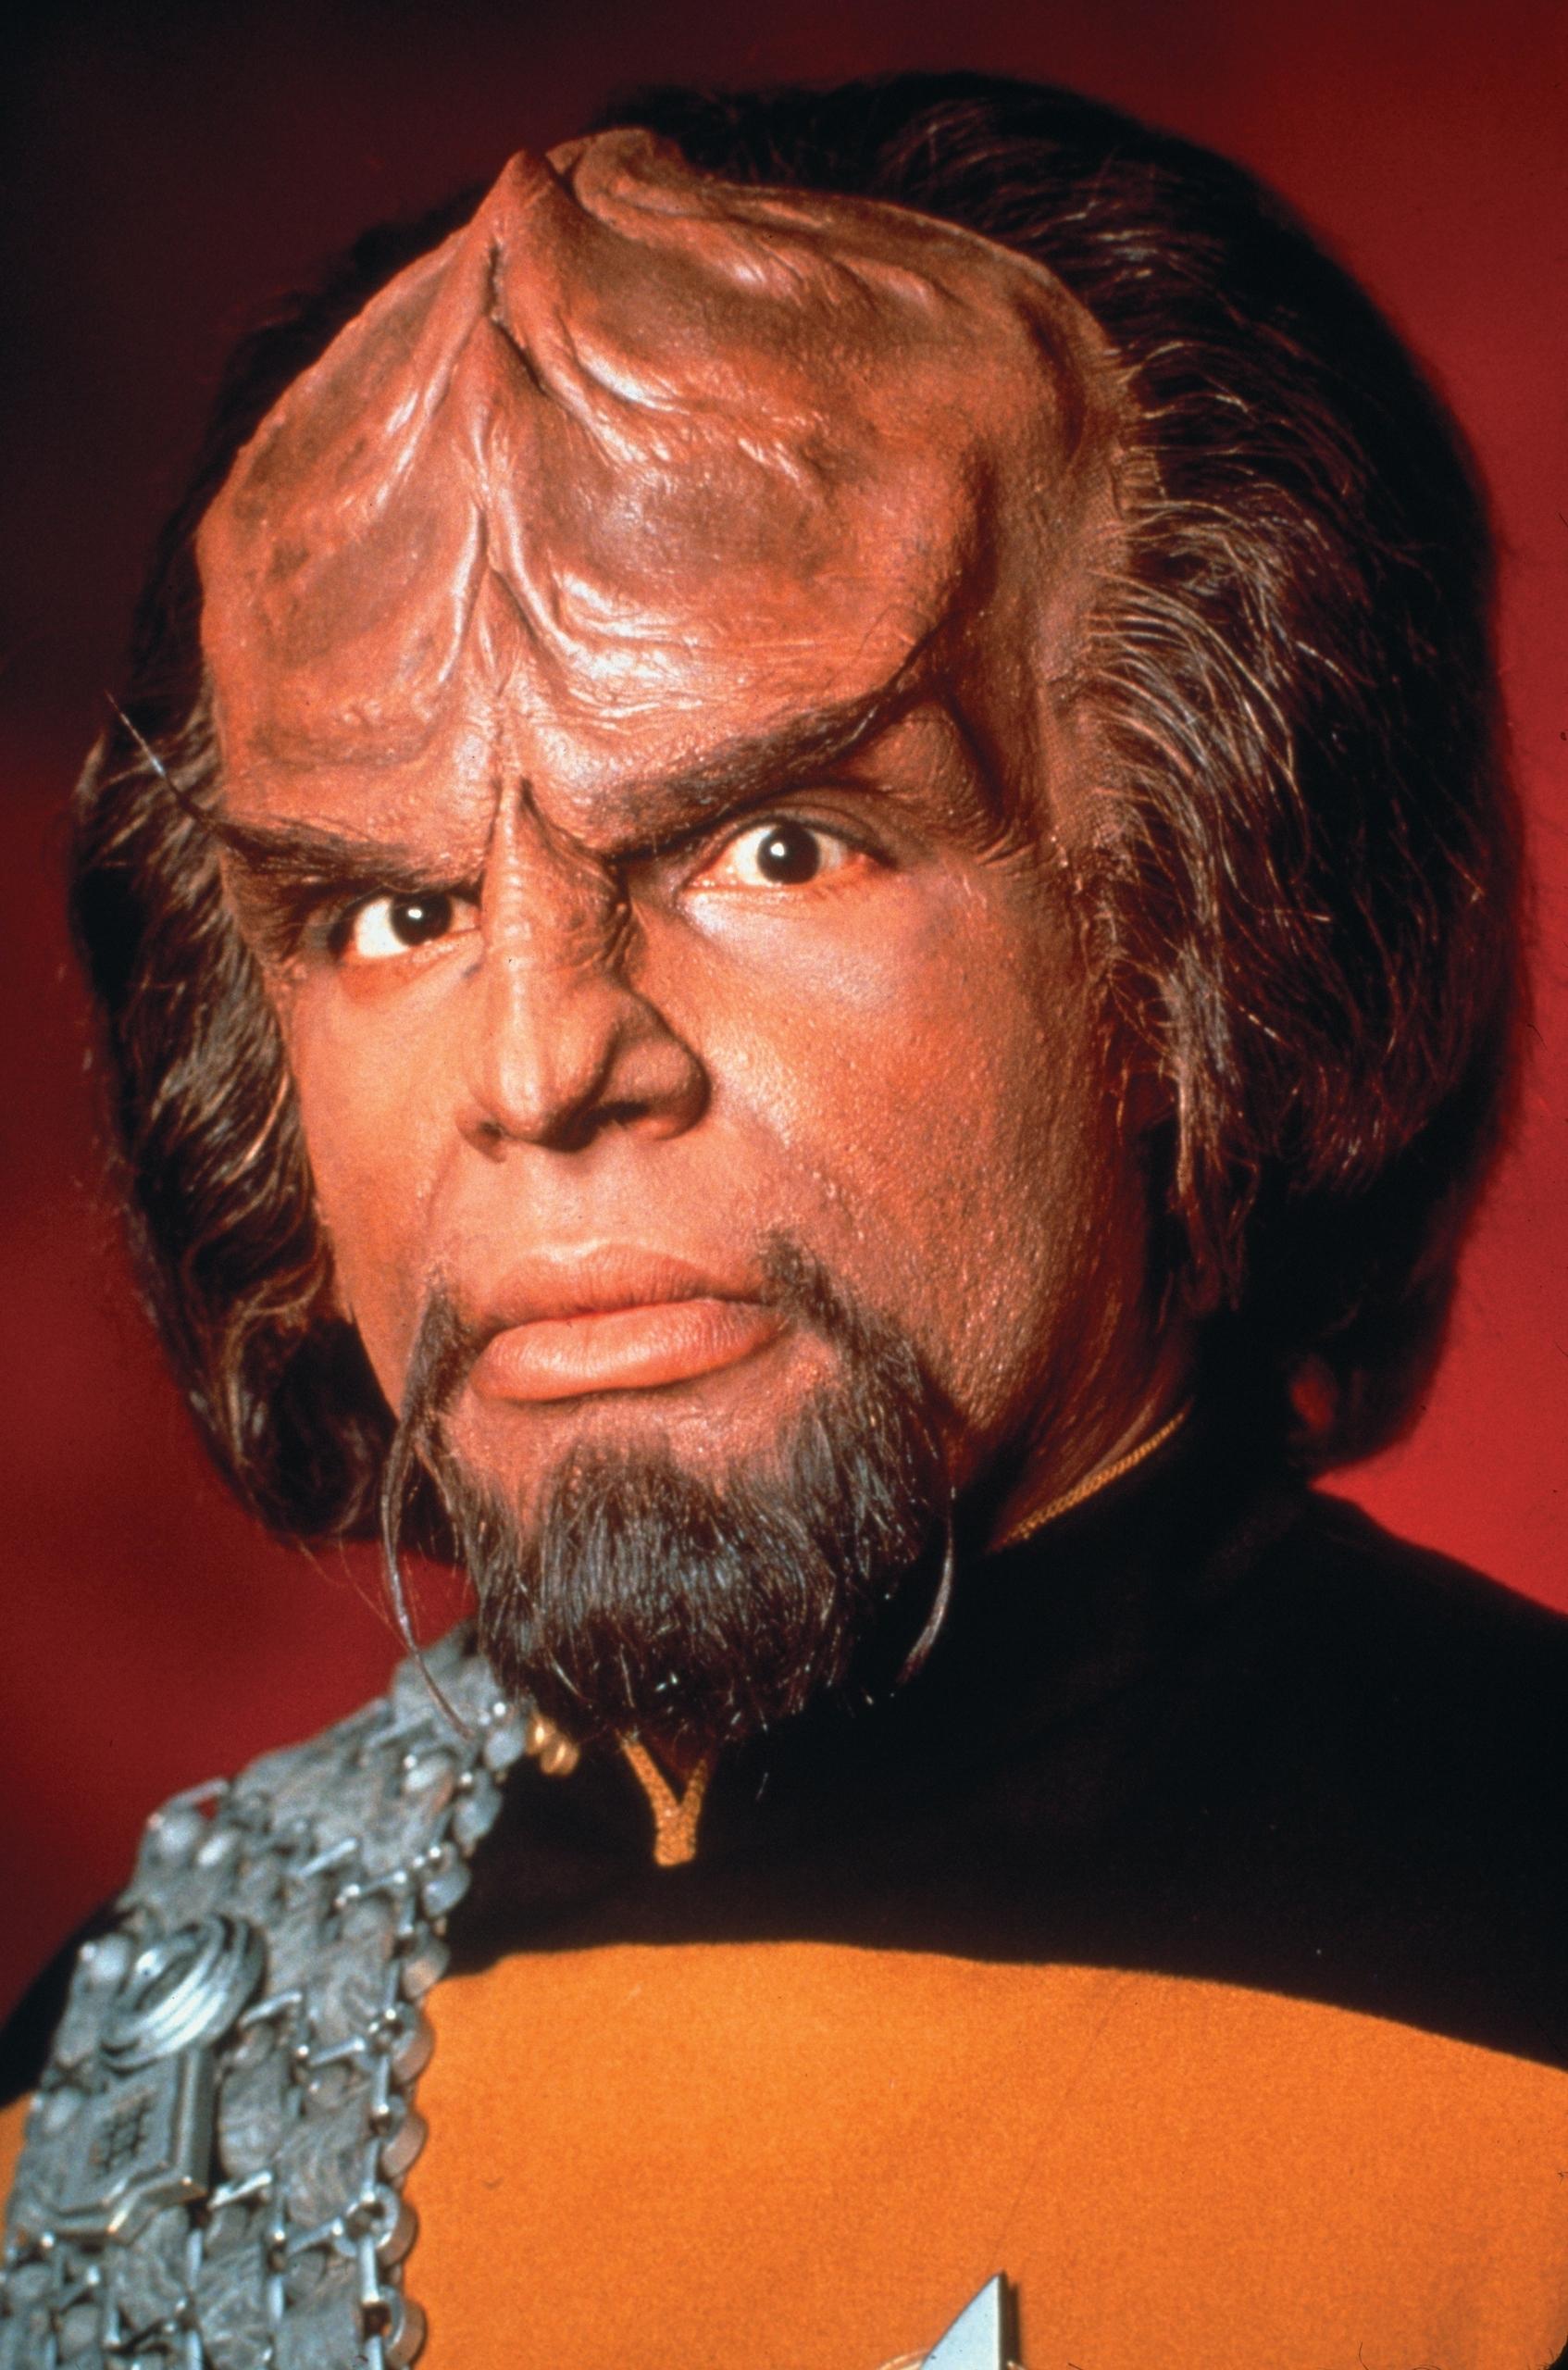 Lieutenant-Worf-star-trek-the-next-generation-9406774-1694-2560.jpg